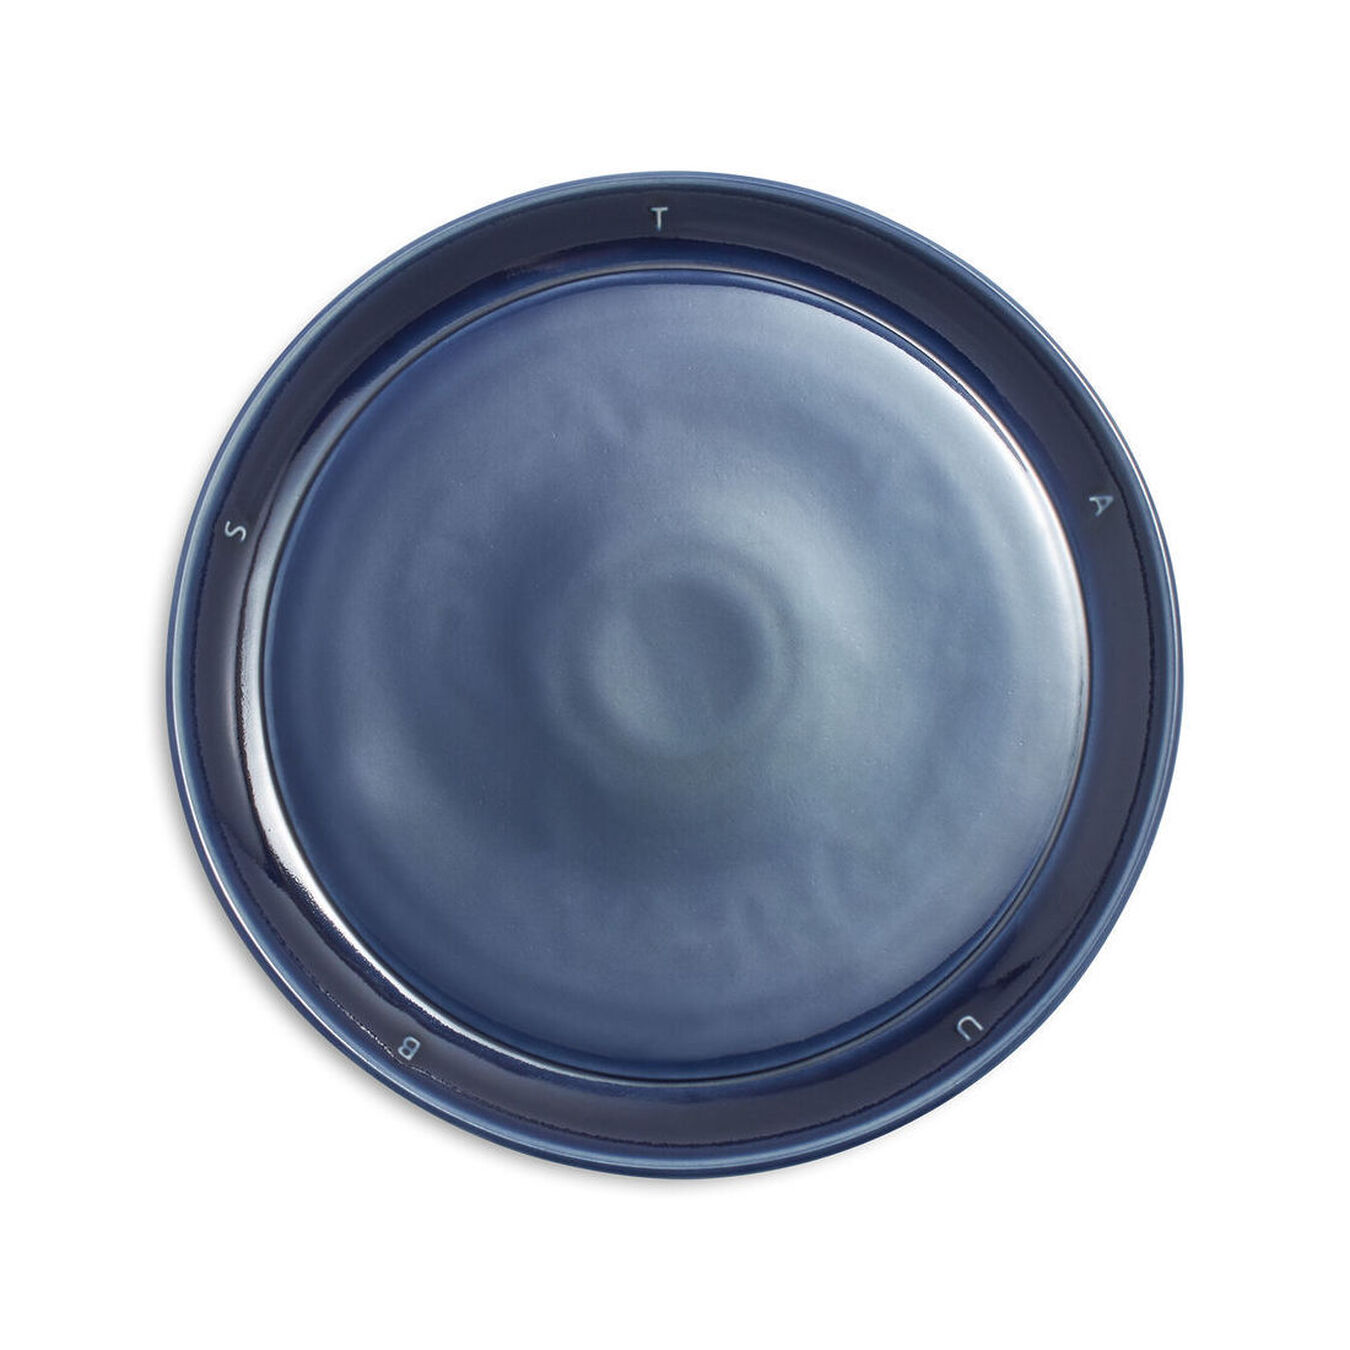 "8.5-inch, Salad Plate 22cm / 8.6"" - Dark Blue, Dark Blue,,large 1"